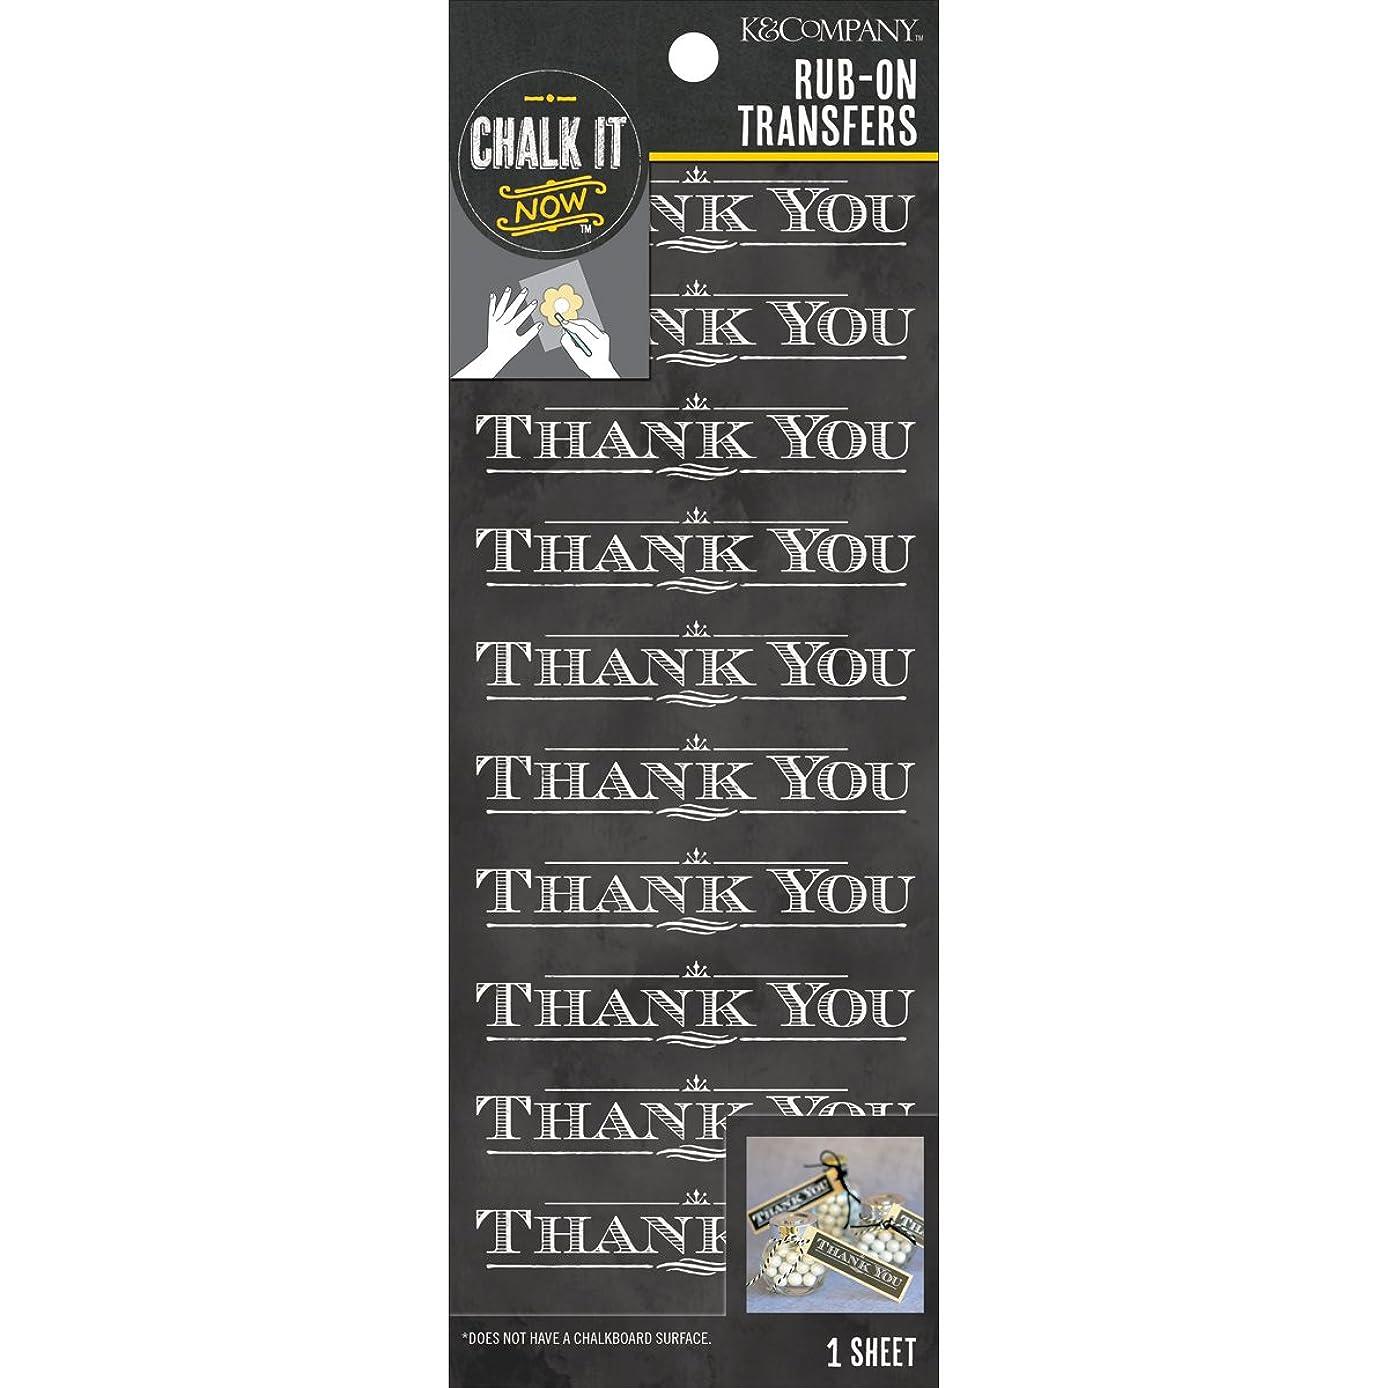 K&Company Chalk it Now Thank You Rub-Ons